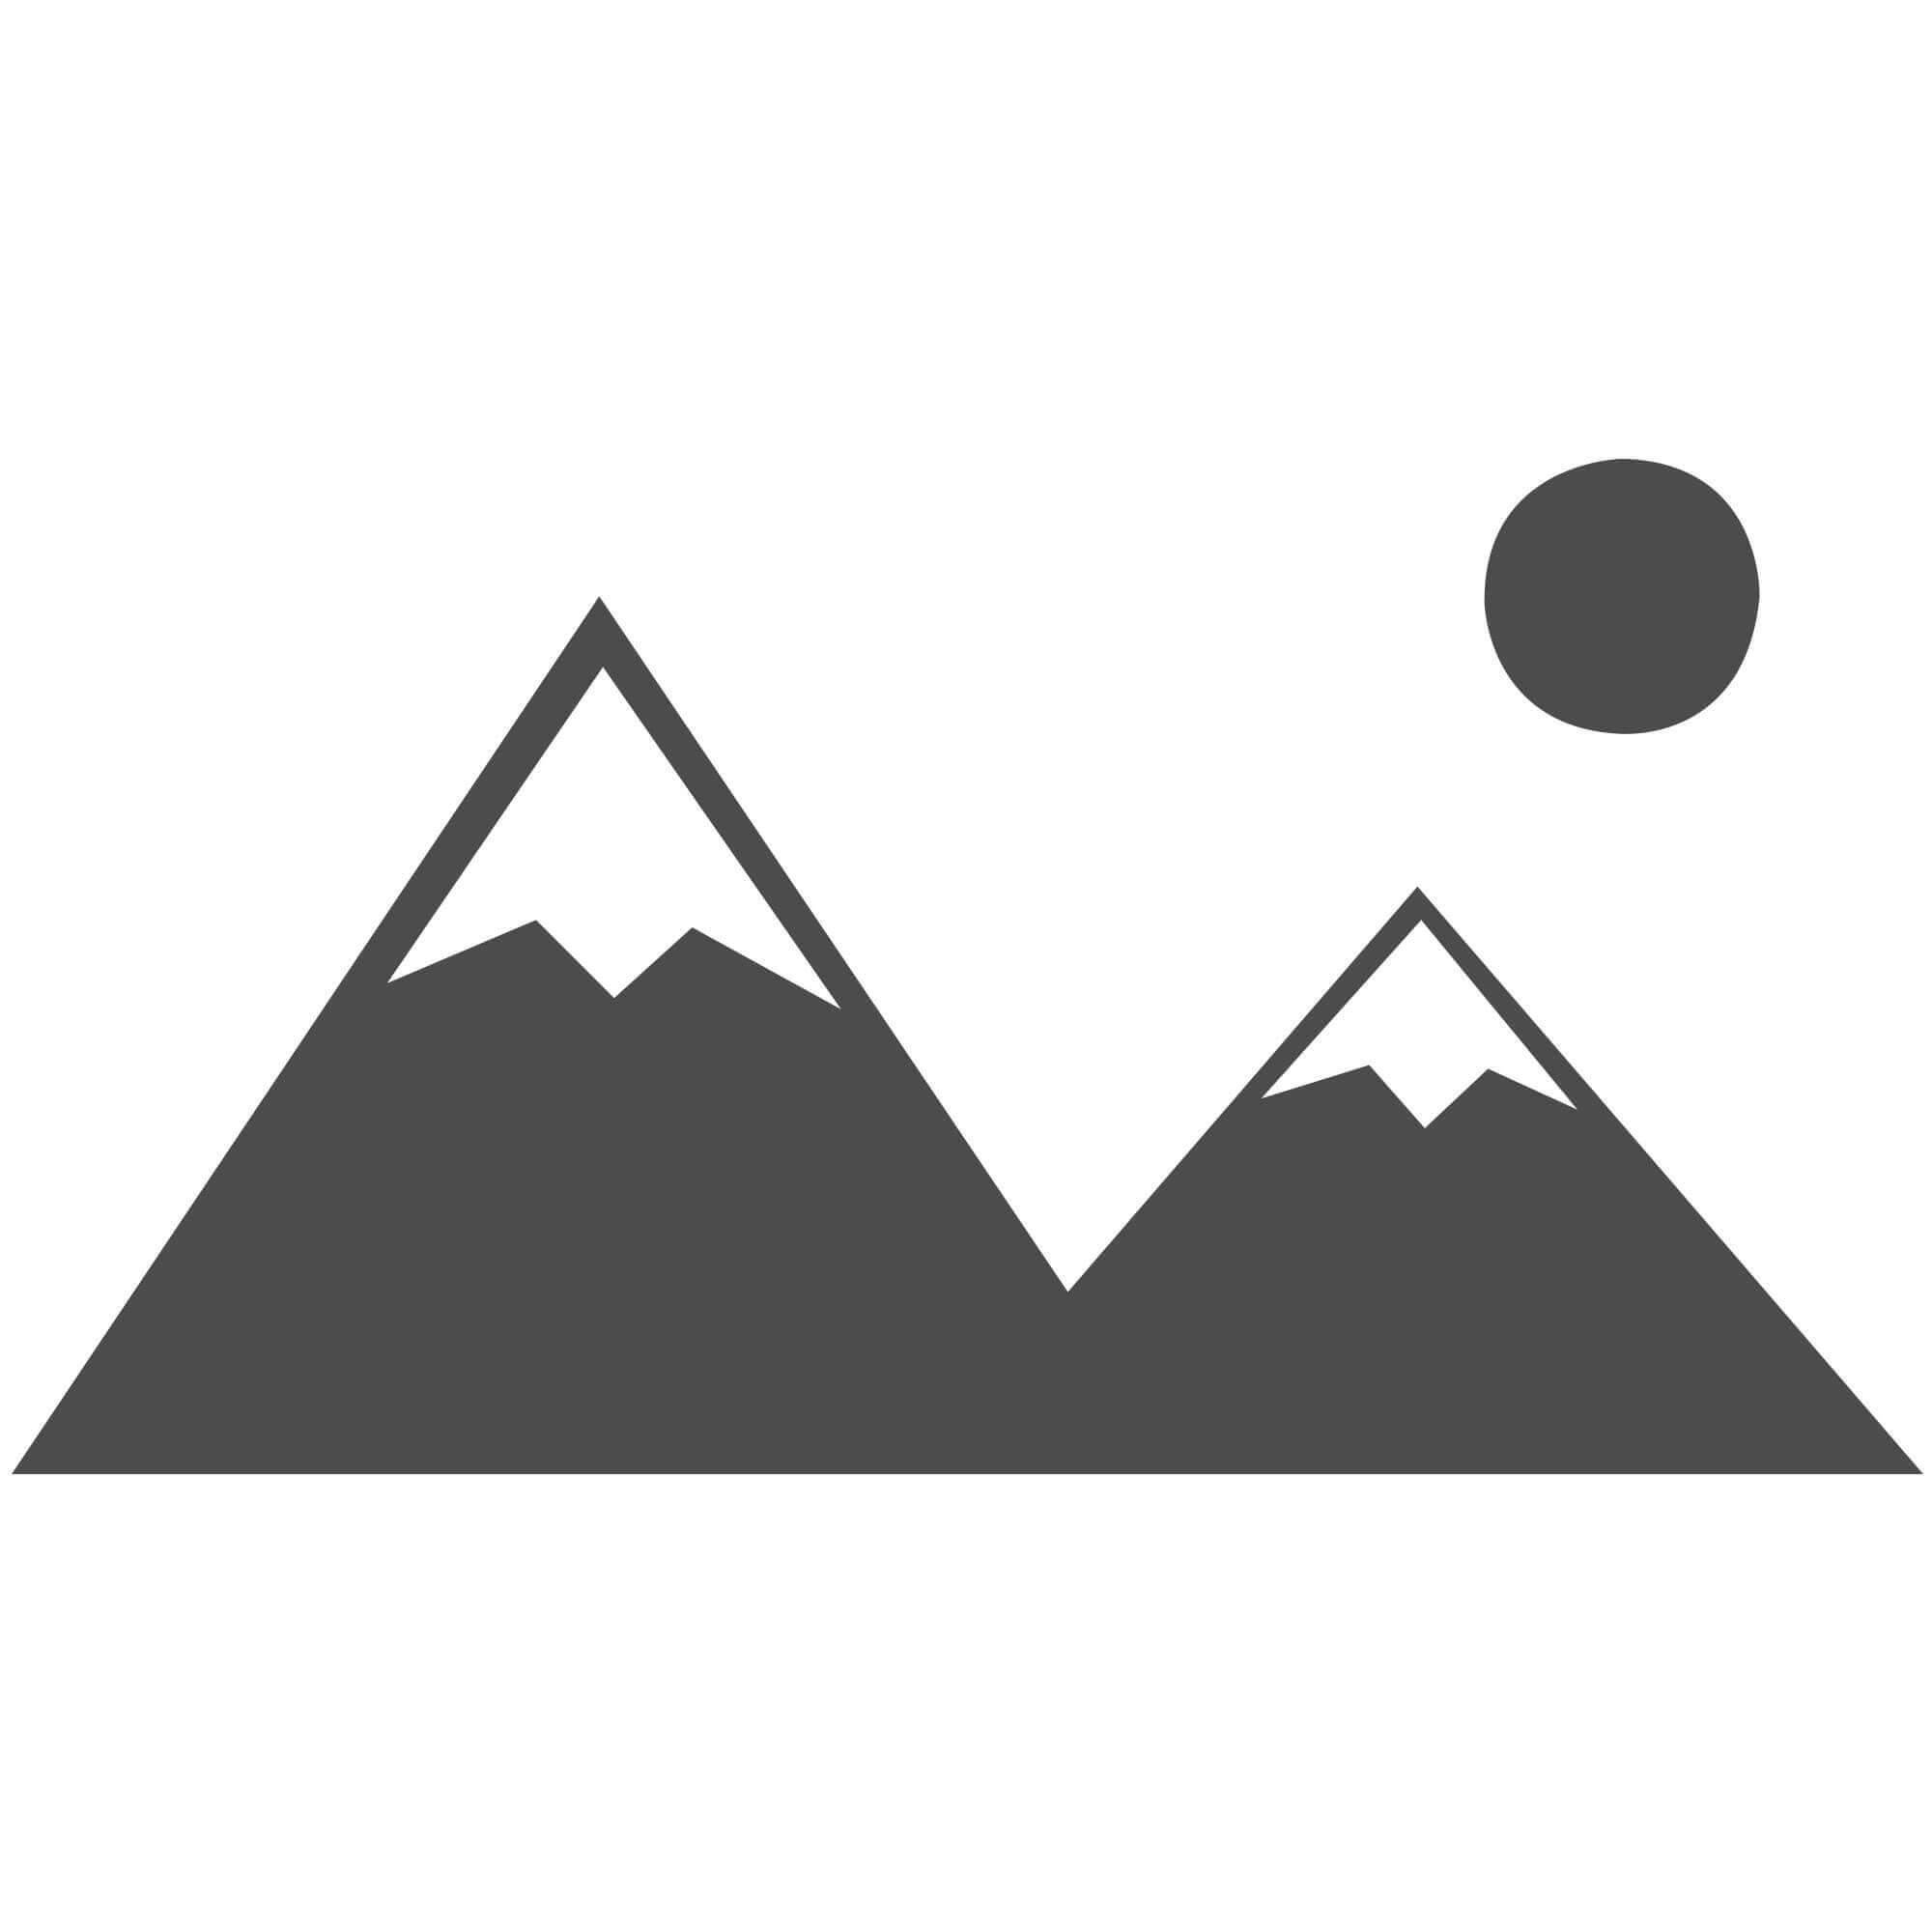 "Velvet Shaggy Rug - Natural - Size 80 x 150 cm (2'8"" x 5')"